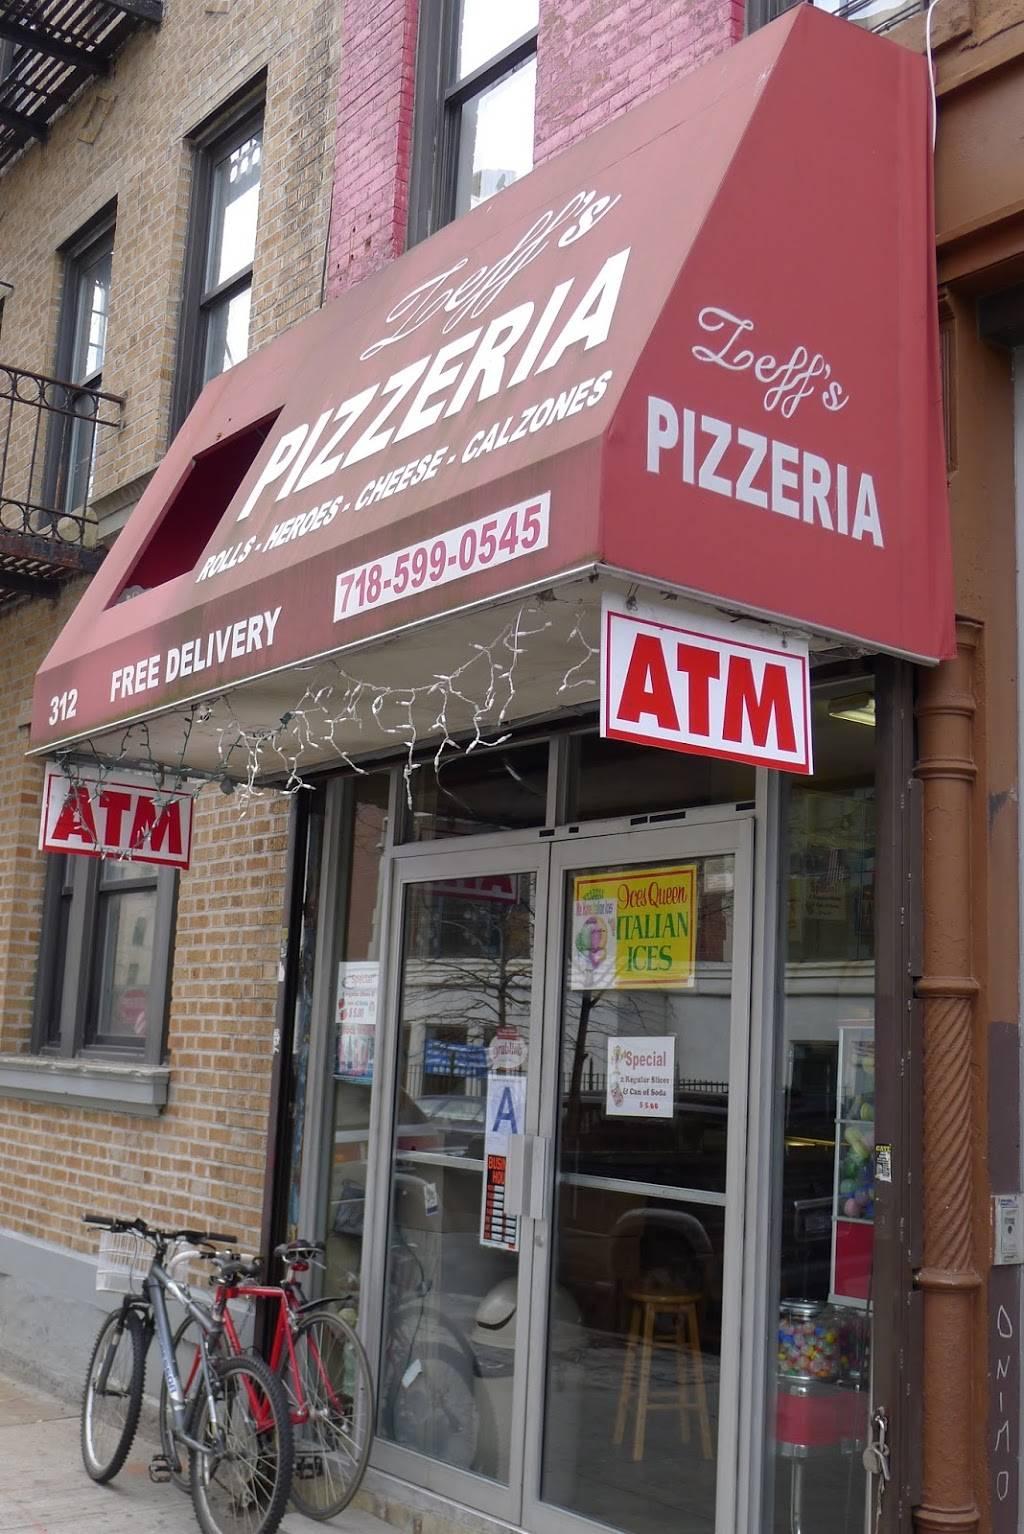 Zeffs Pizzeria   restaurant   312 S 3rd St, Brooklyn, NY 11211, USA   7185990545 OR +1 718-599-0545